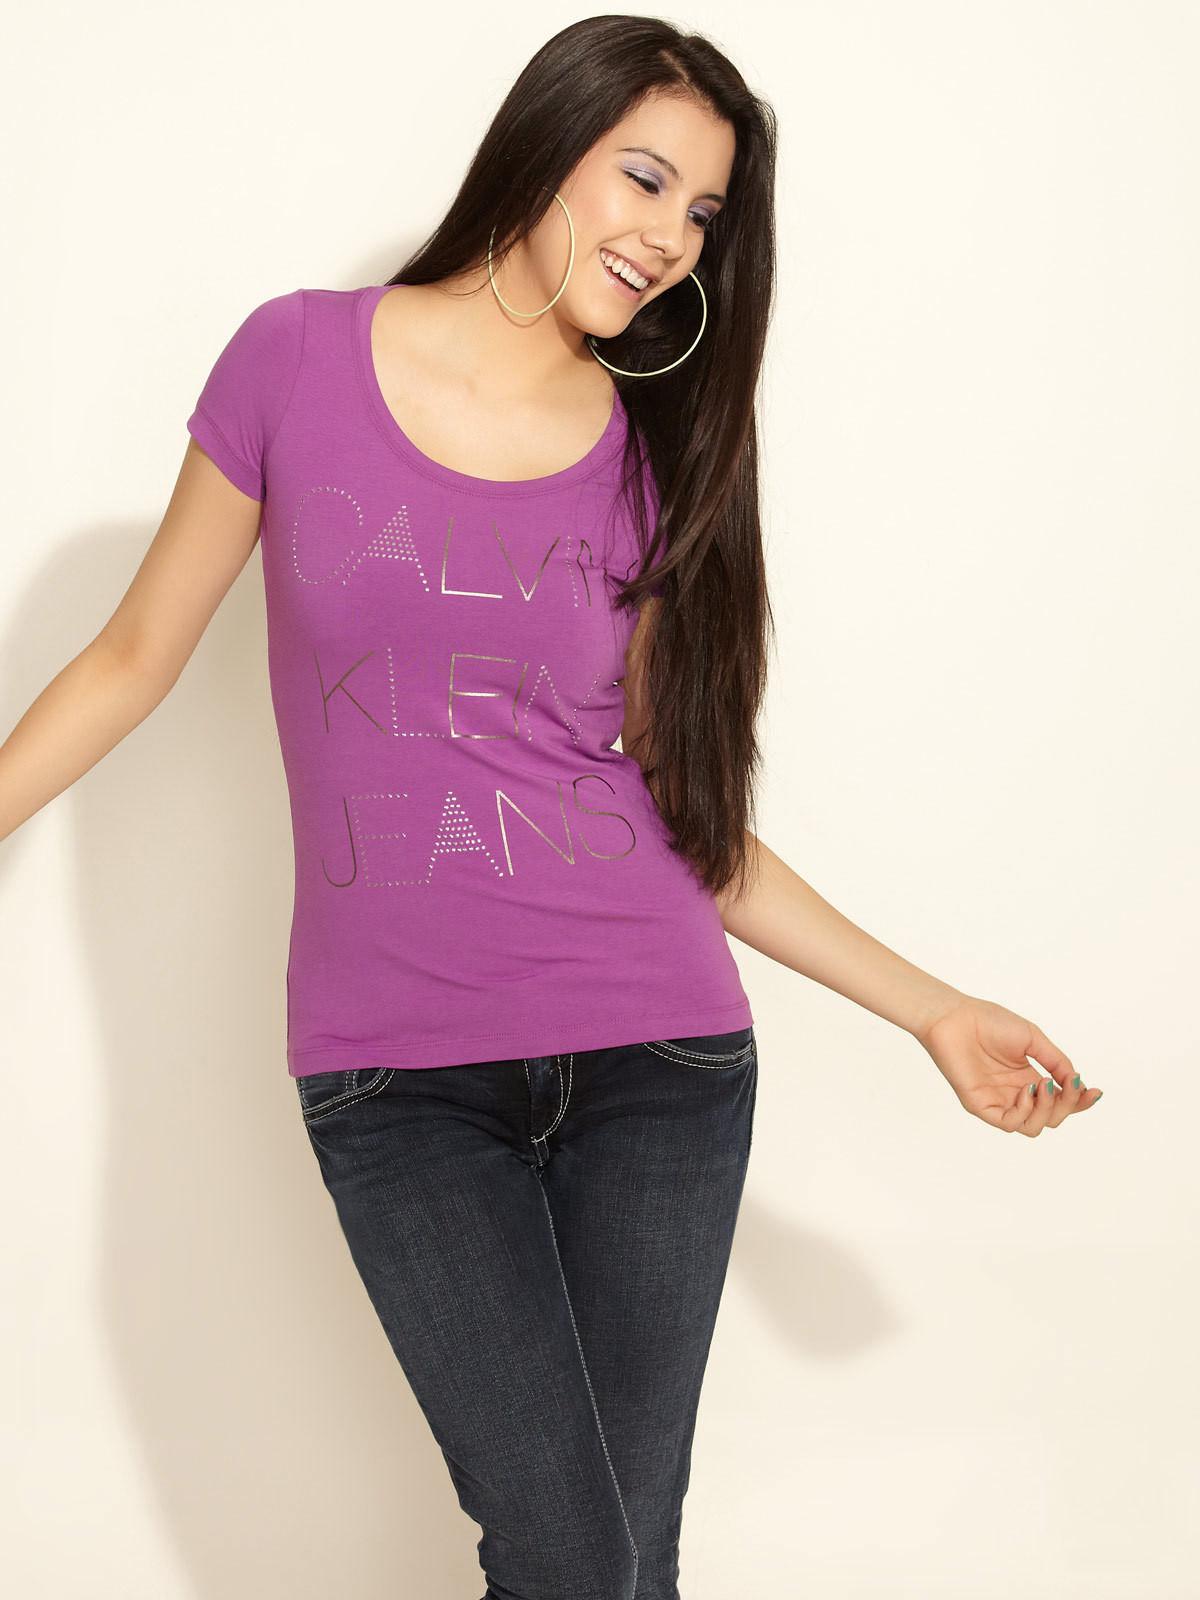 8ed0a02528 Calvin Klein Jeans Price list in India. Buy Calvin Klein Jeans ...